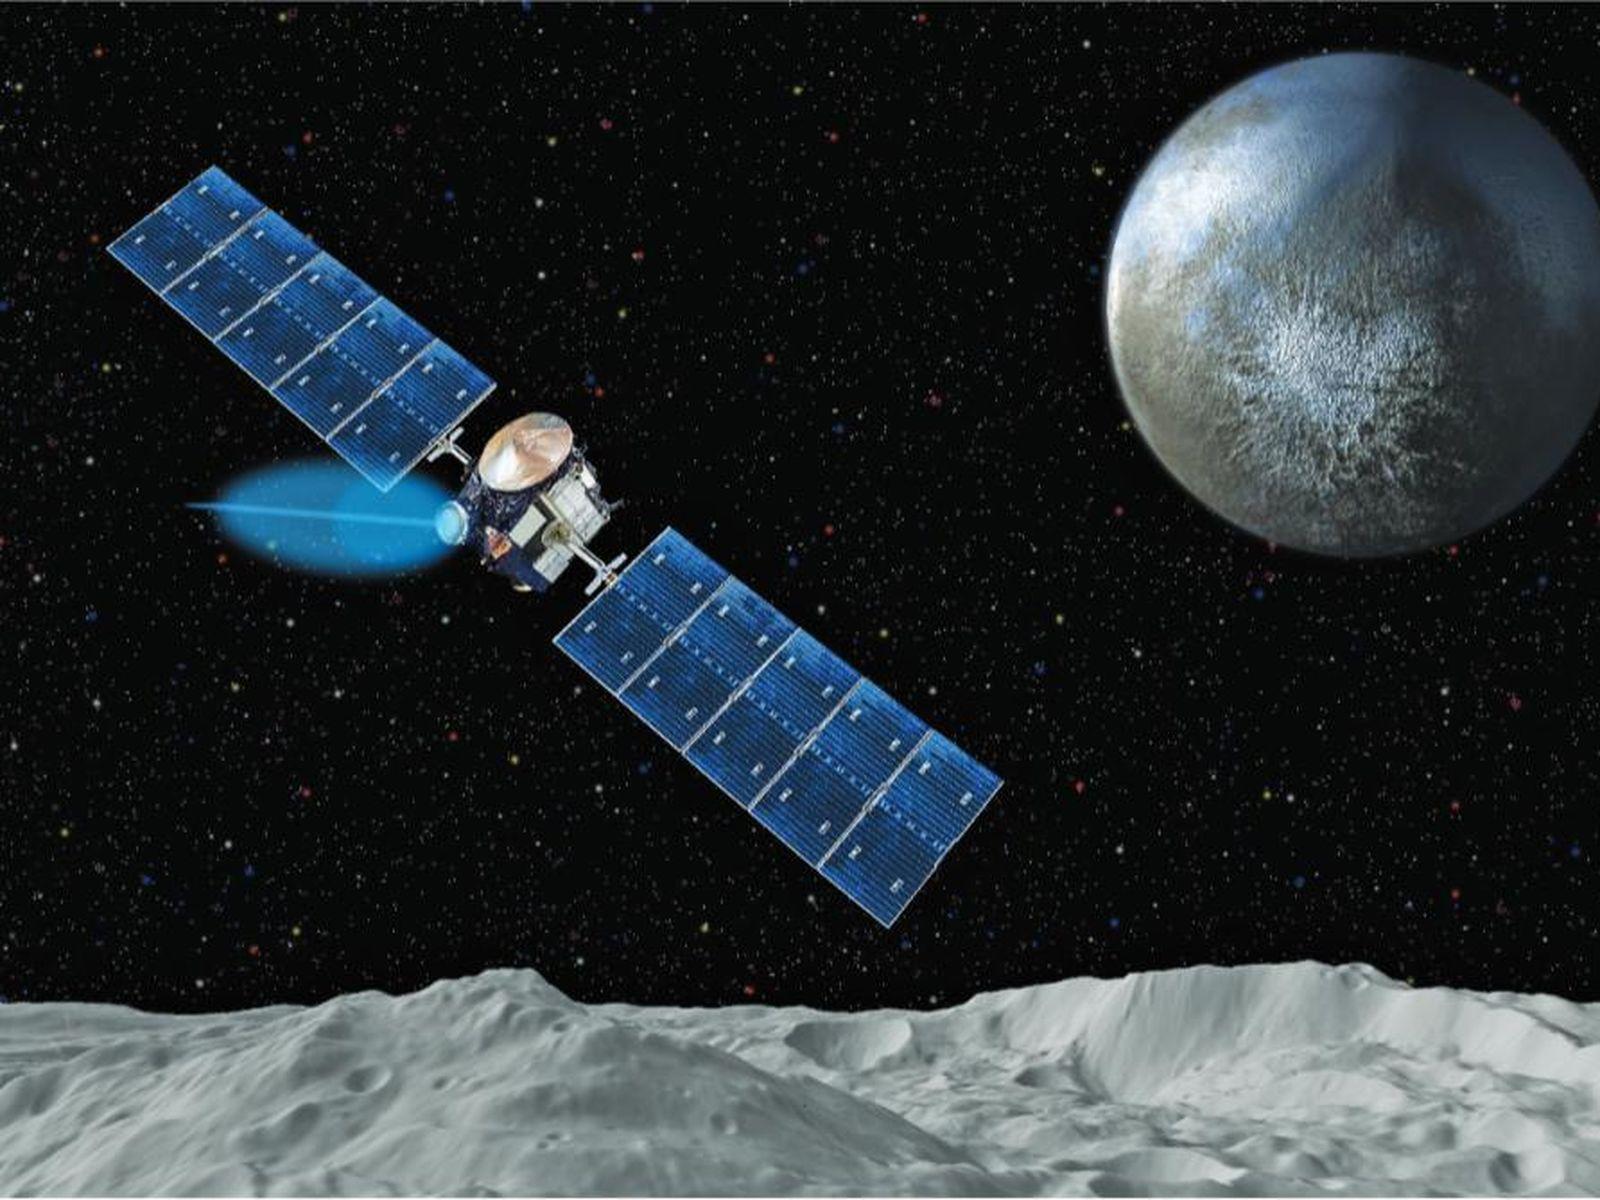 nasa dawn spacecraft diagram - photo #40